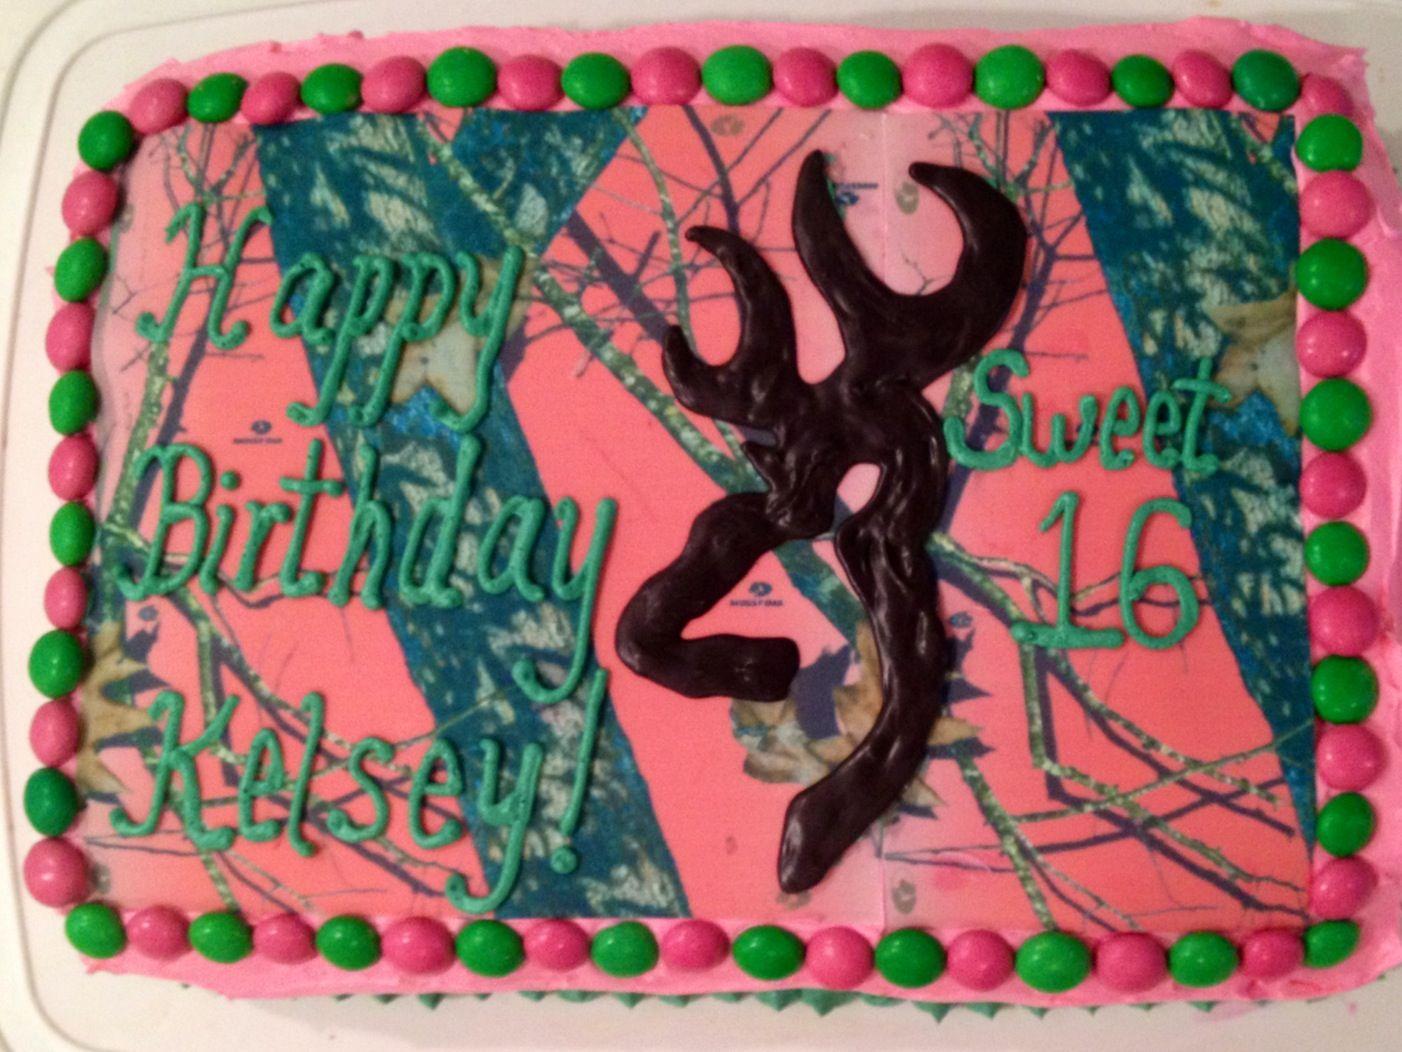 Kelseys sweet 16 pink mossy oak camo browning buckhead cake kelseys sweet 16 pink mossy oak camo browning buckhead cake biocorpaavc Images